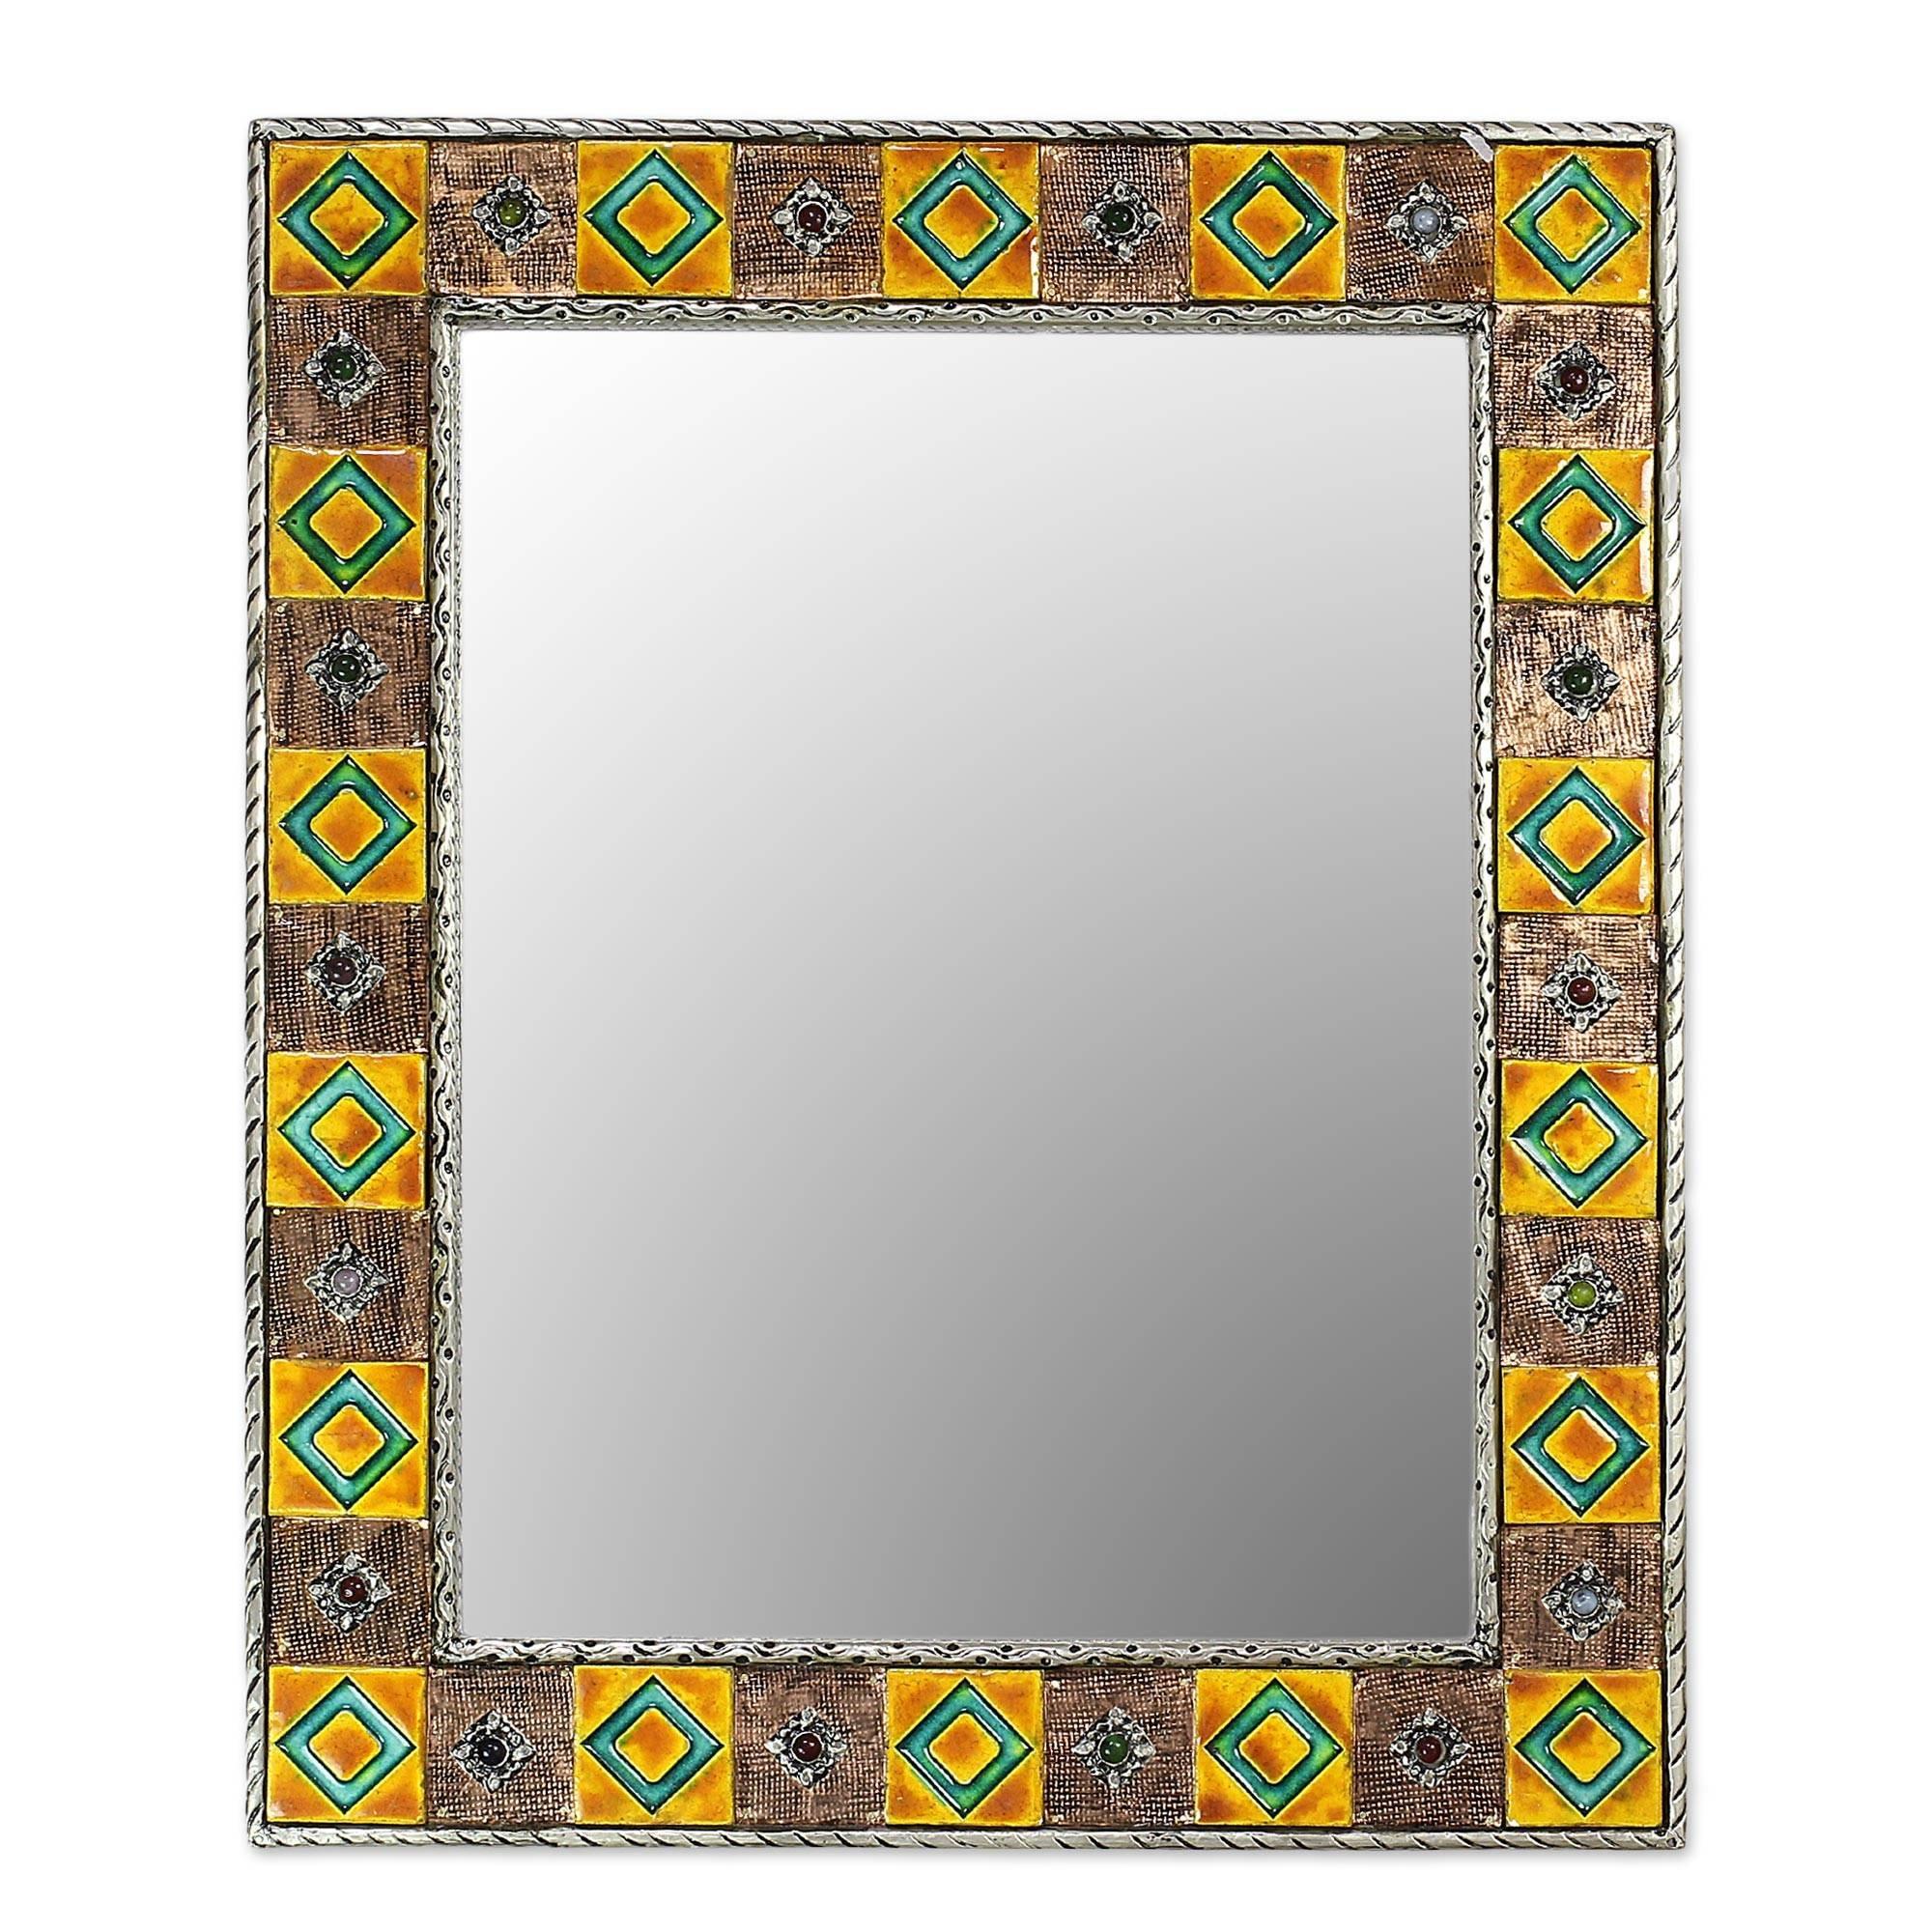 NOVICA Hollywood Glam Wood Wall Mounted Mirror, Earthtone, 'Autumn Warmth'